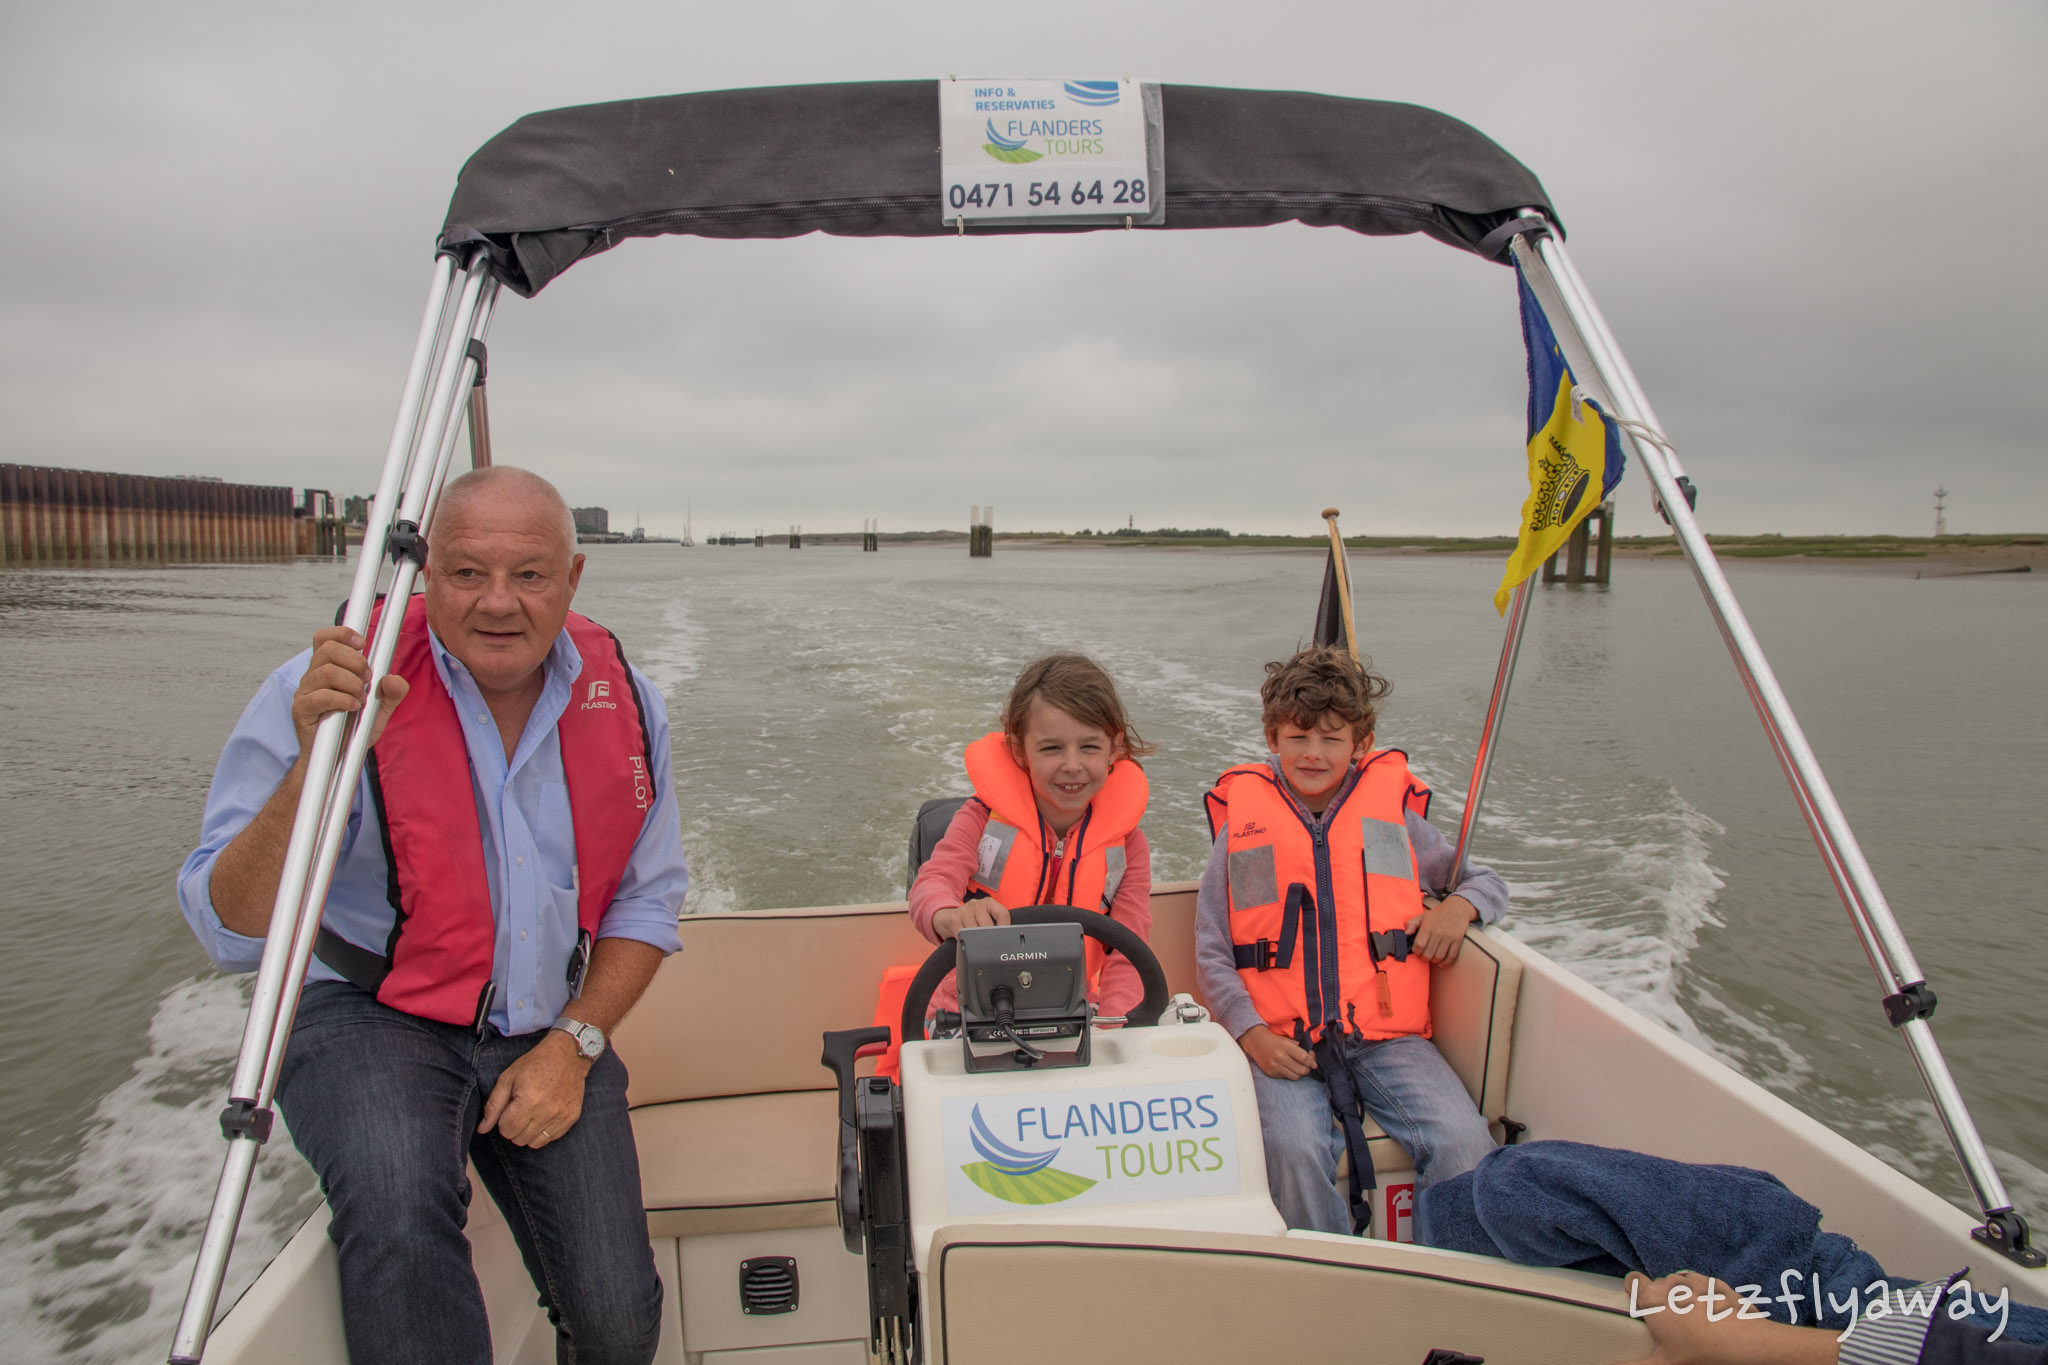 Flanders Tours Boat Tour Nieuwpoort